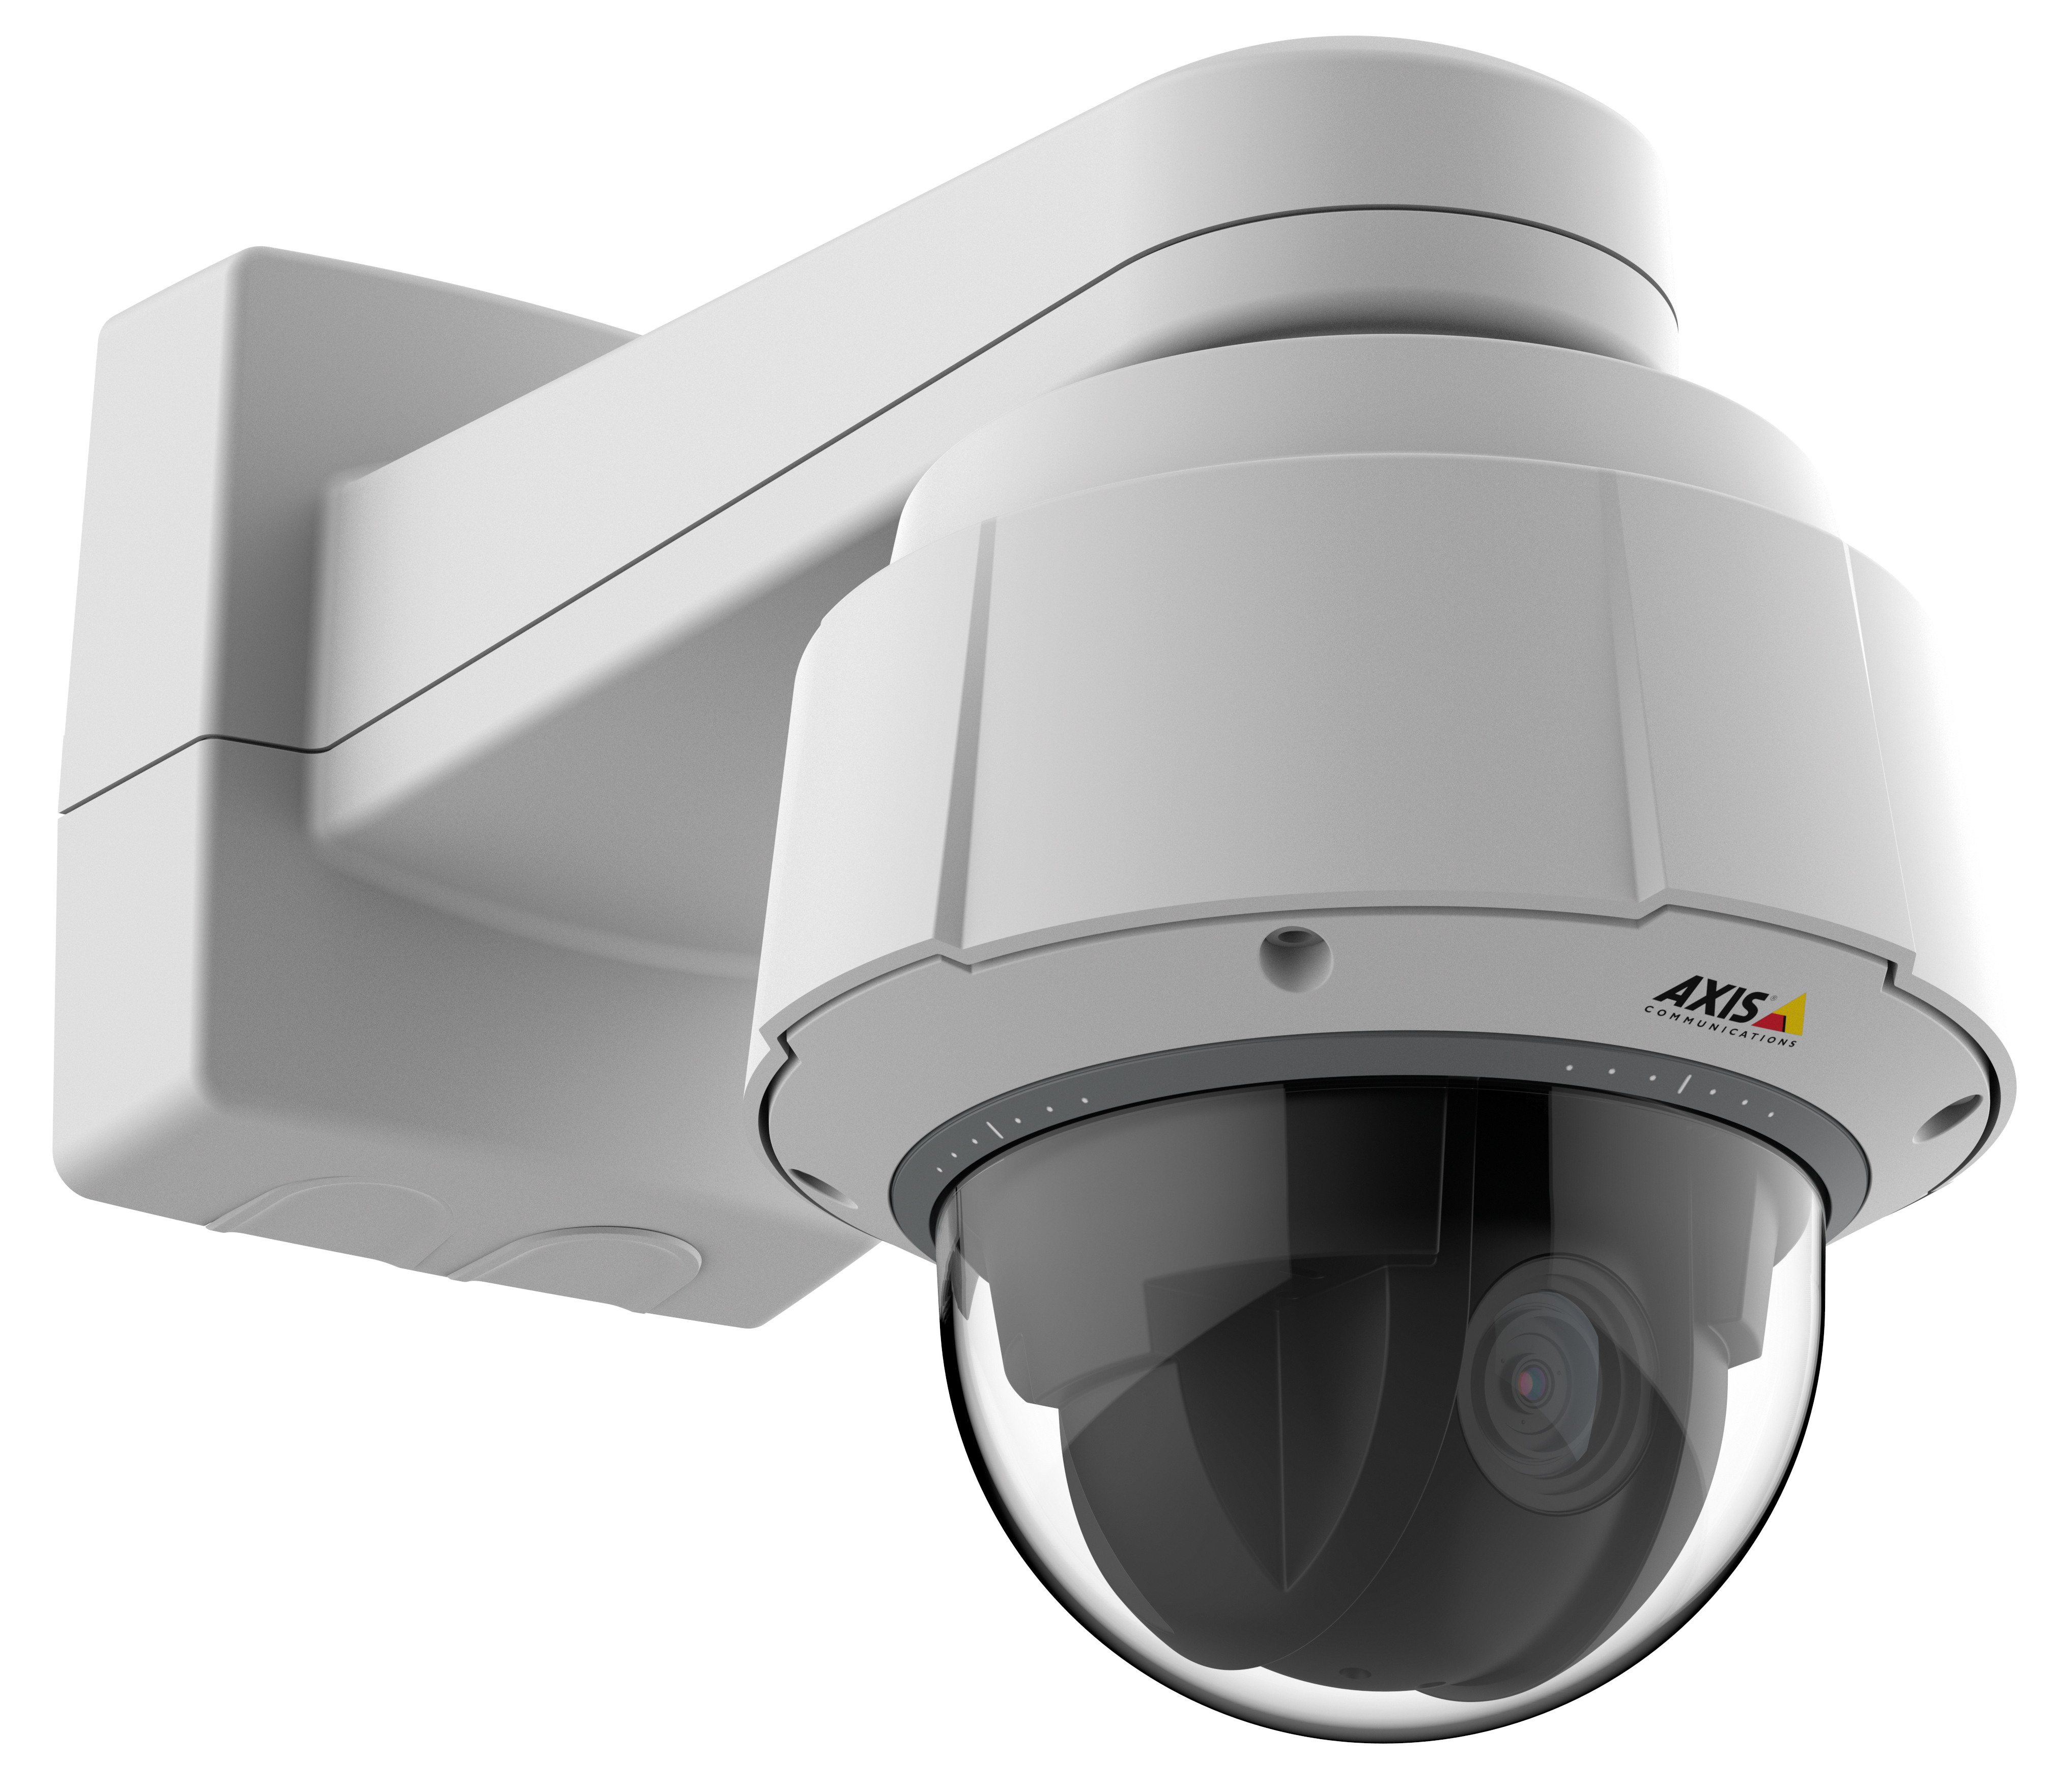 Axis Q6055 E Outdoor Ptz Dome Network Camera 0909 002